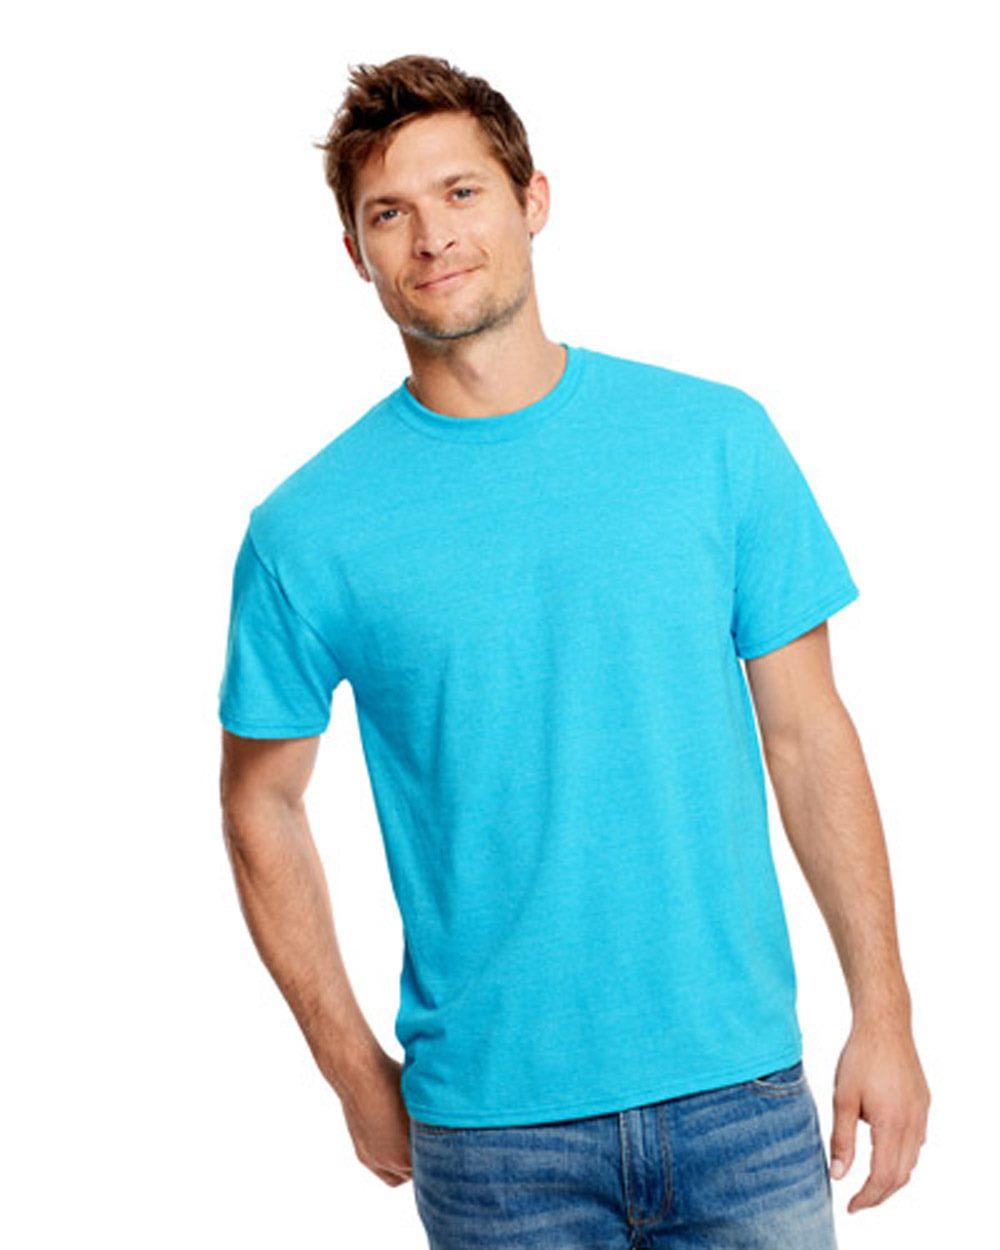 Hanes - X-Temp Triblend Tee with Fresh IQ blue dot apparel